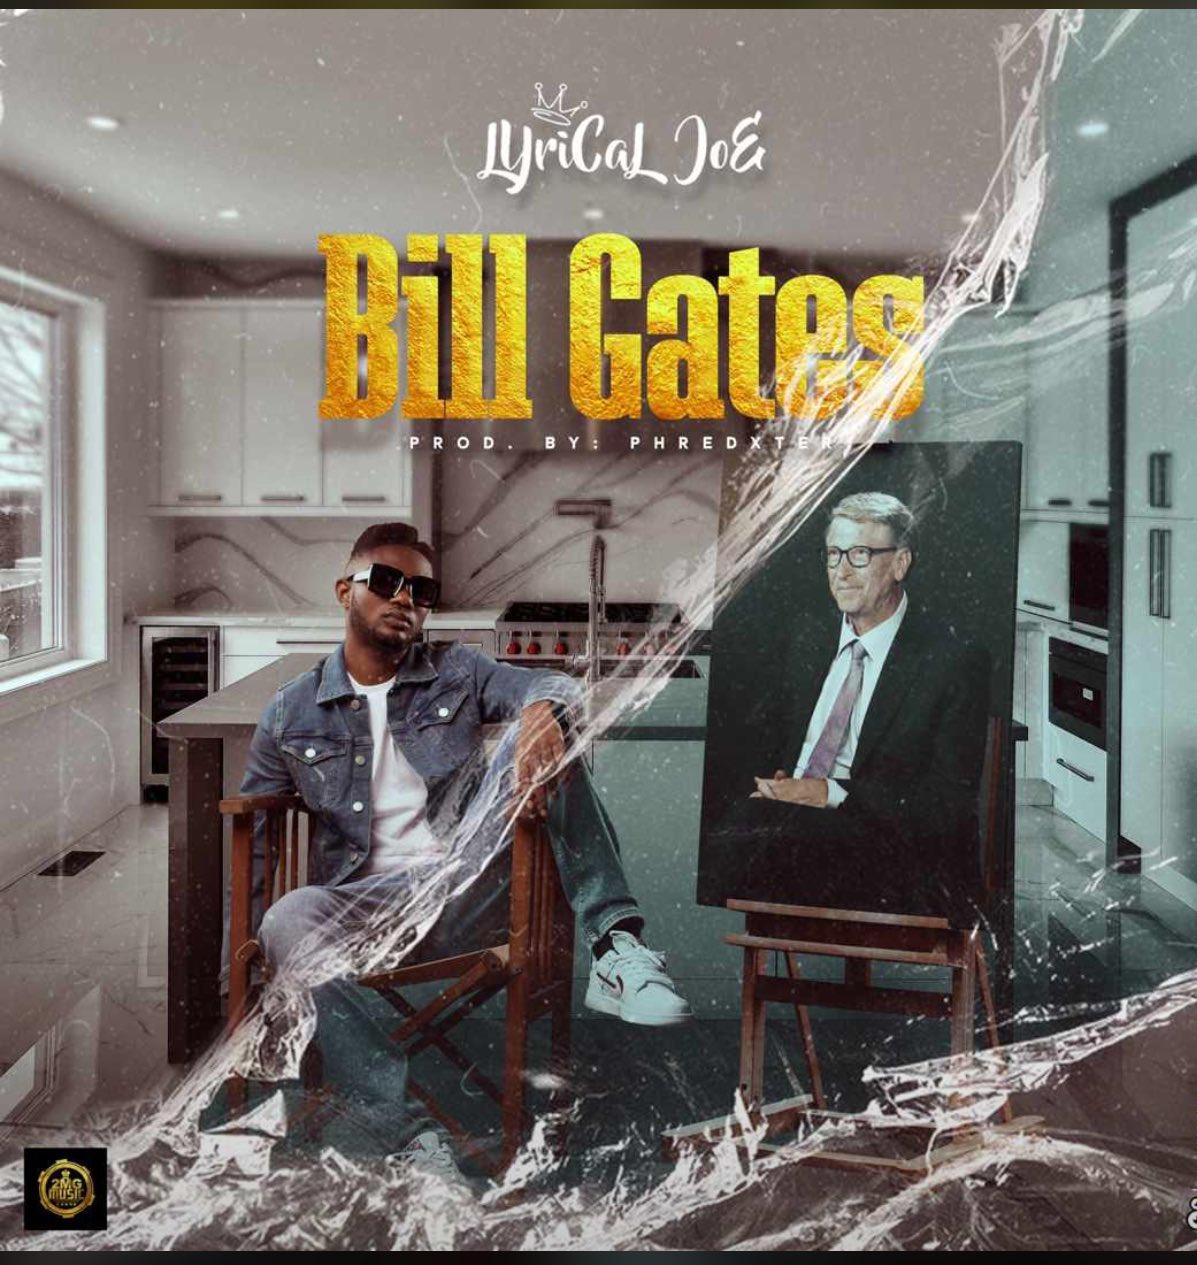 Lyrical Joe - Bill Gates (Prod. by Phredxter)